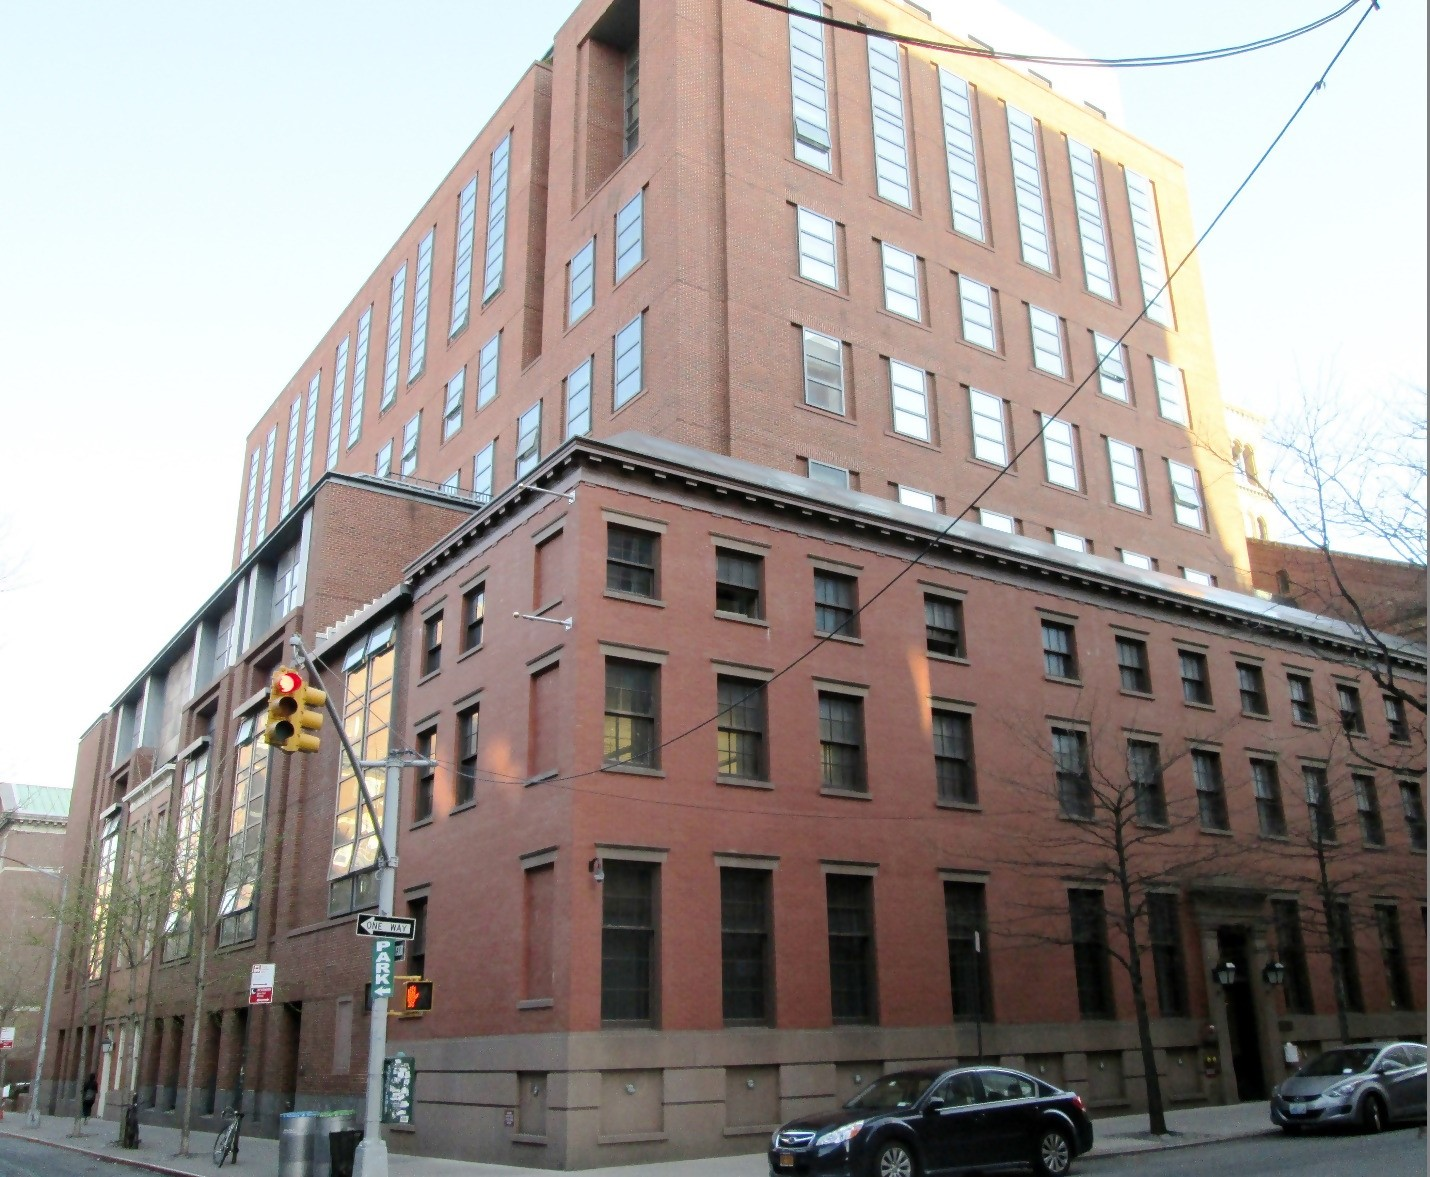 85 West 3rd Street / Furman Hall - Photo